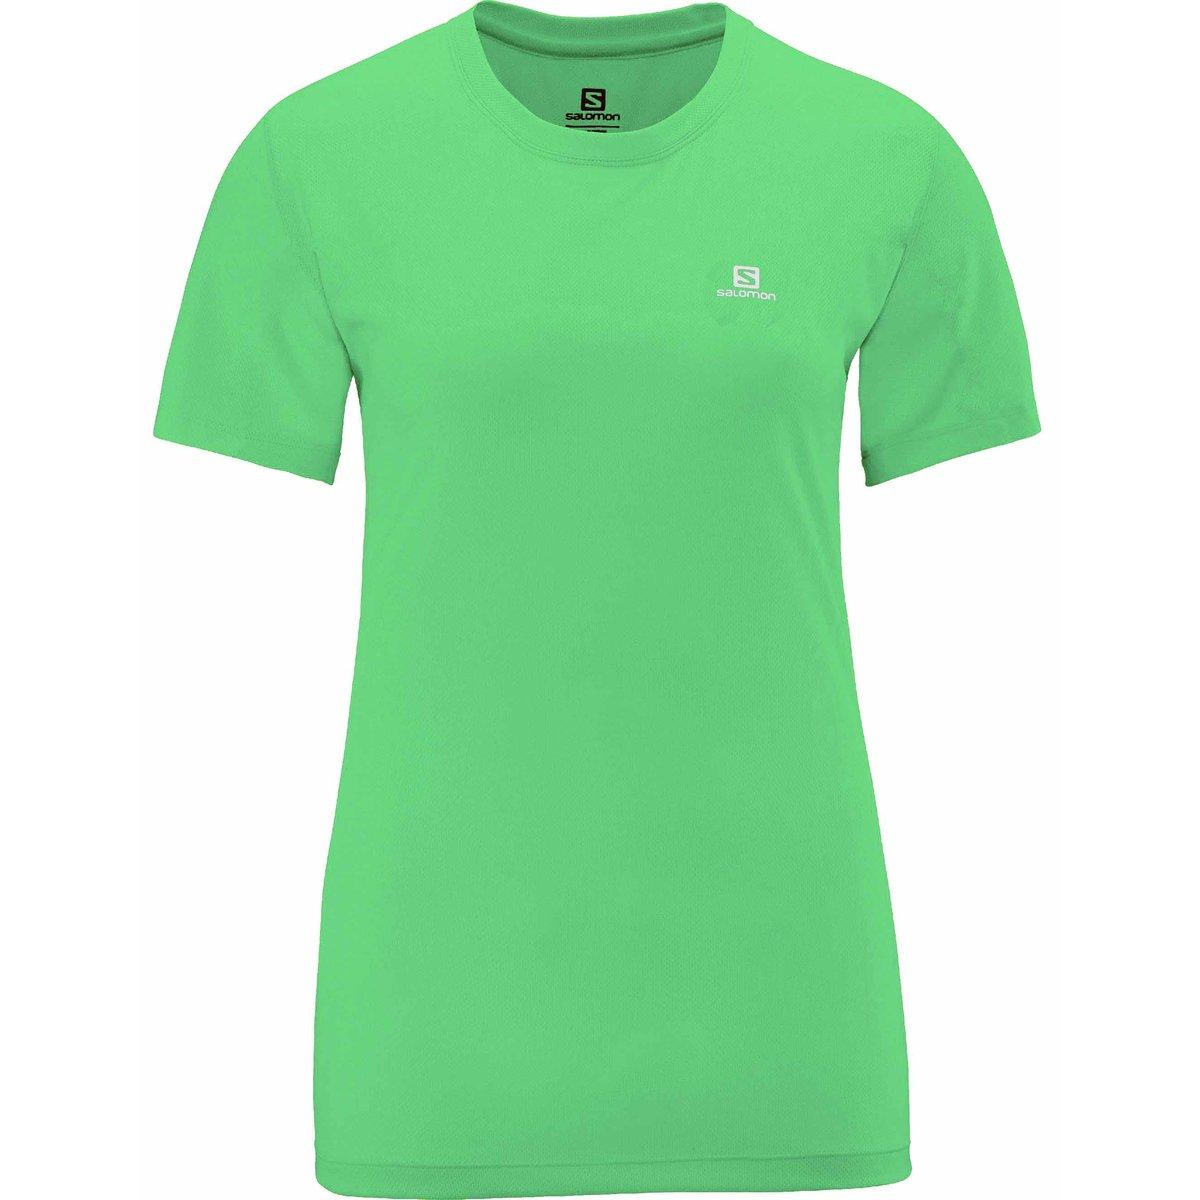 Comet Salomon Salomon Ss Camiseta Camiseta Verde Comet Verde Ss RXaxnER